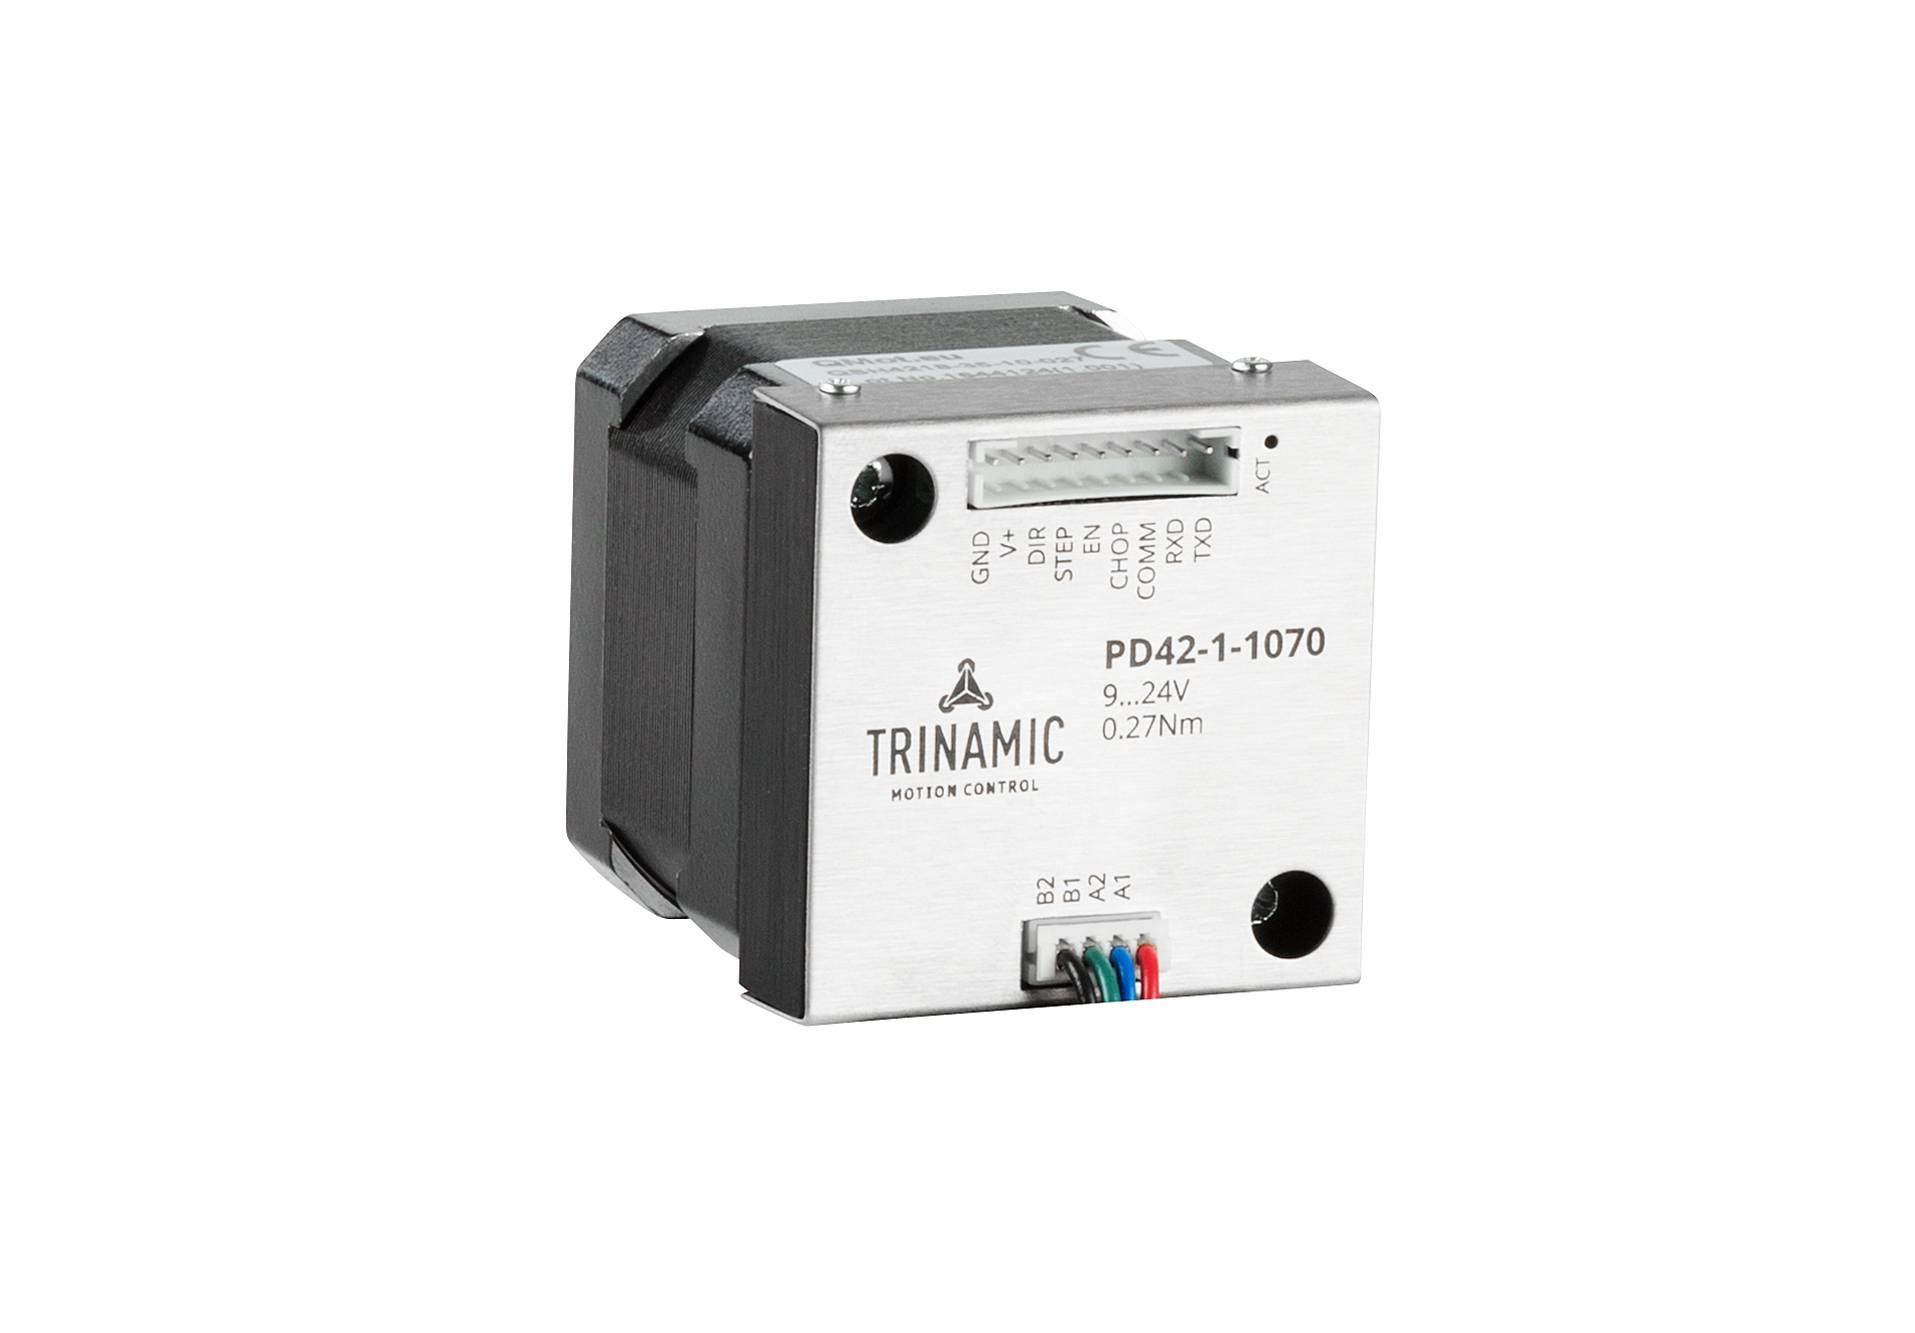 PD42-1-1070